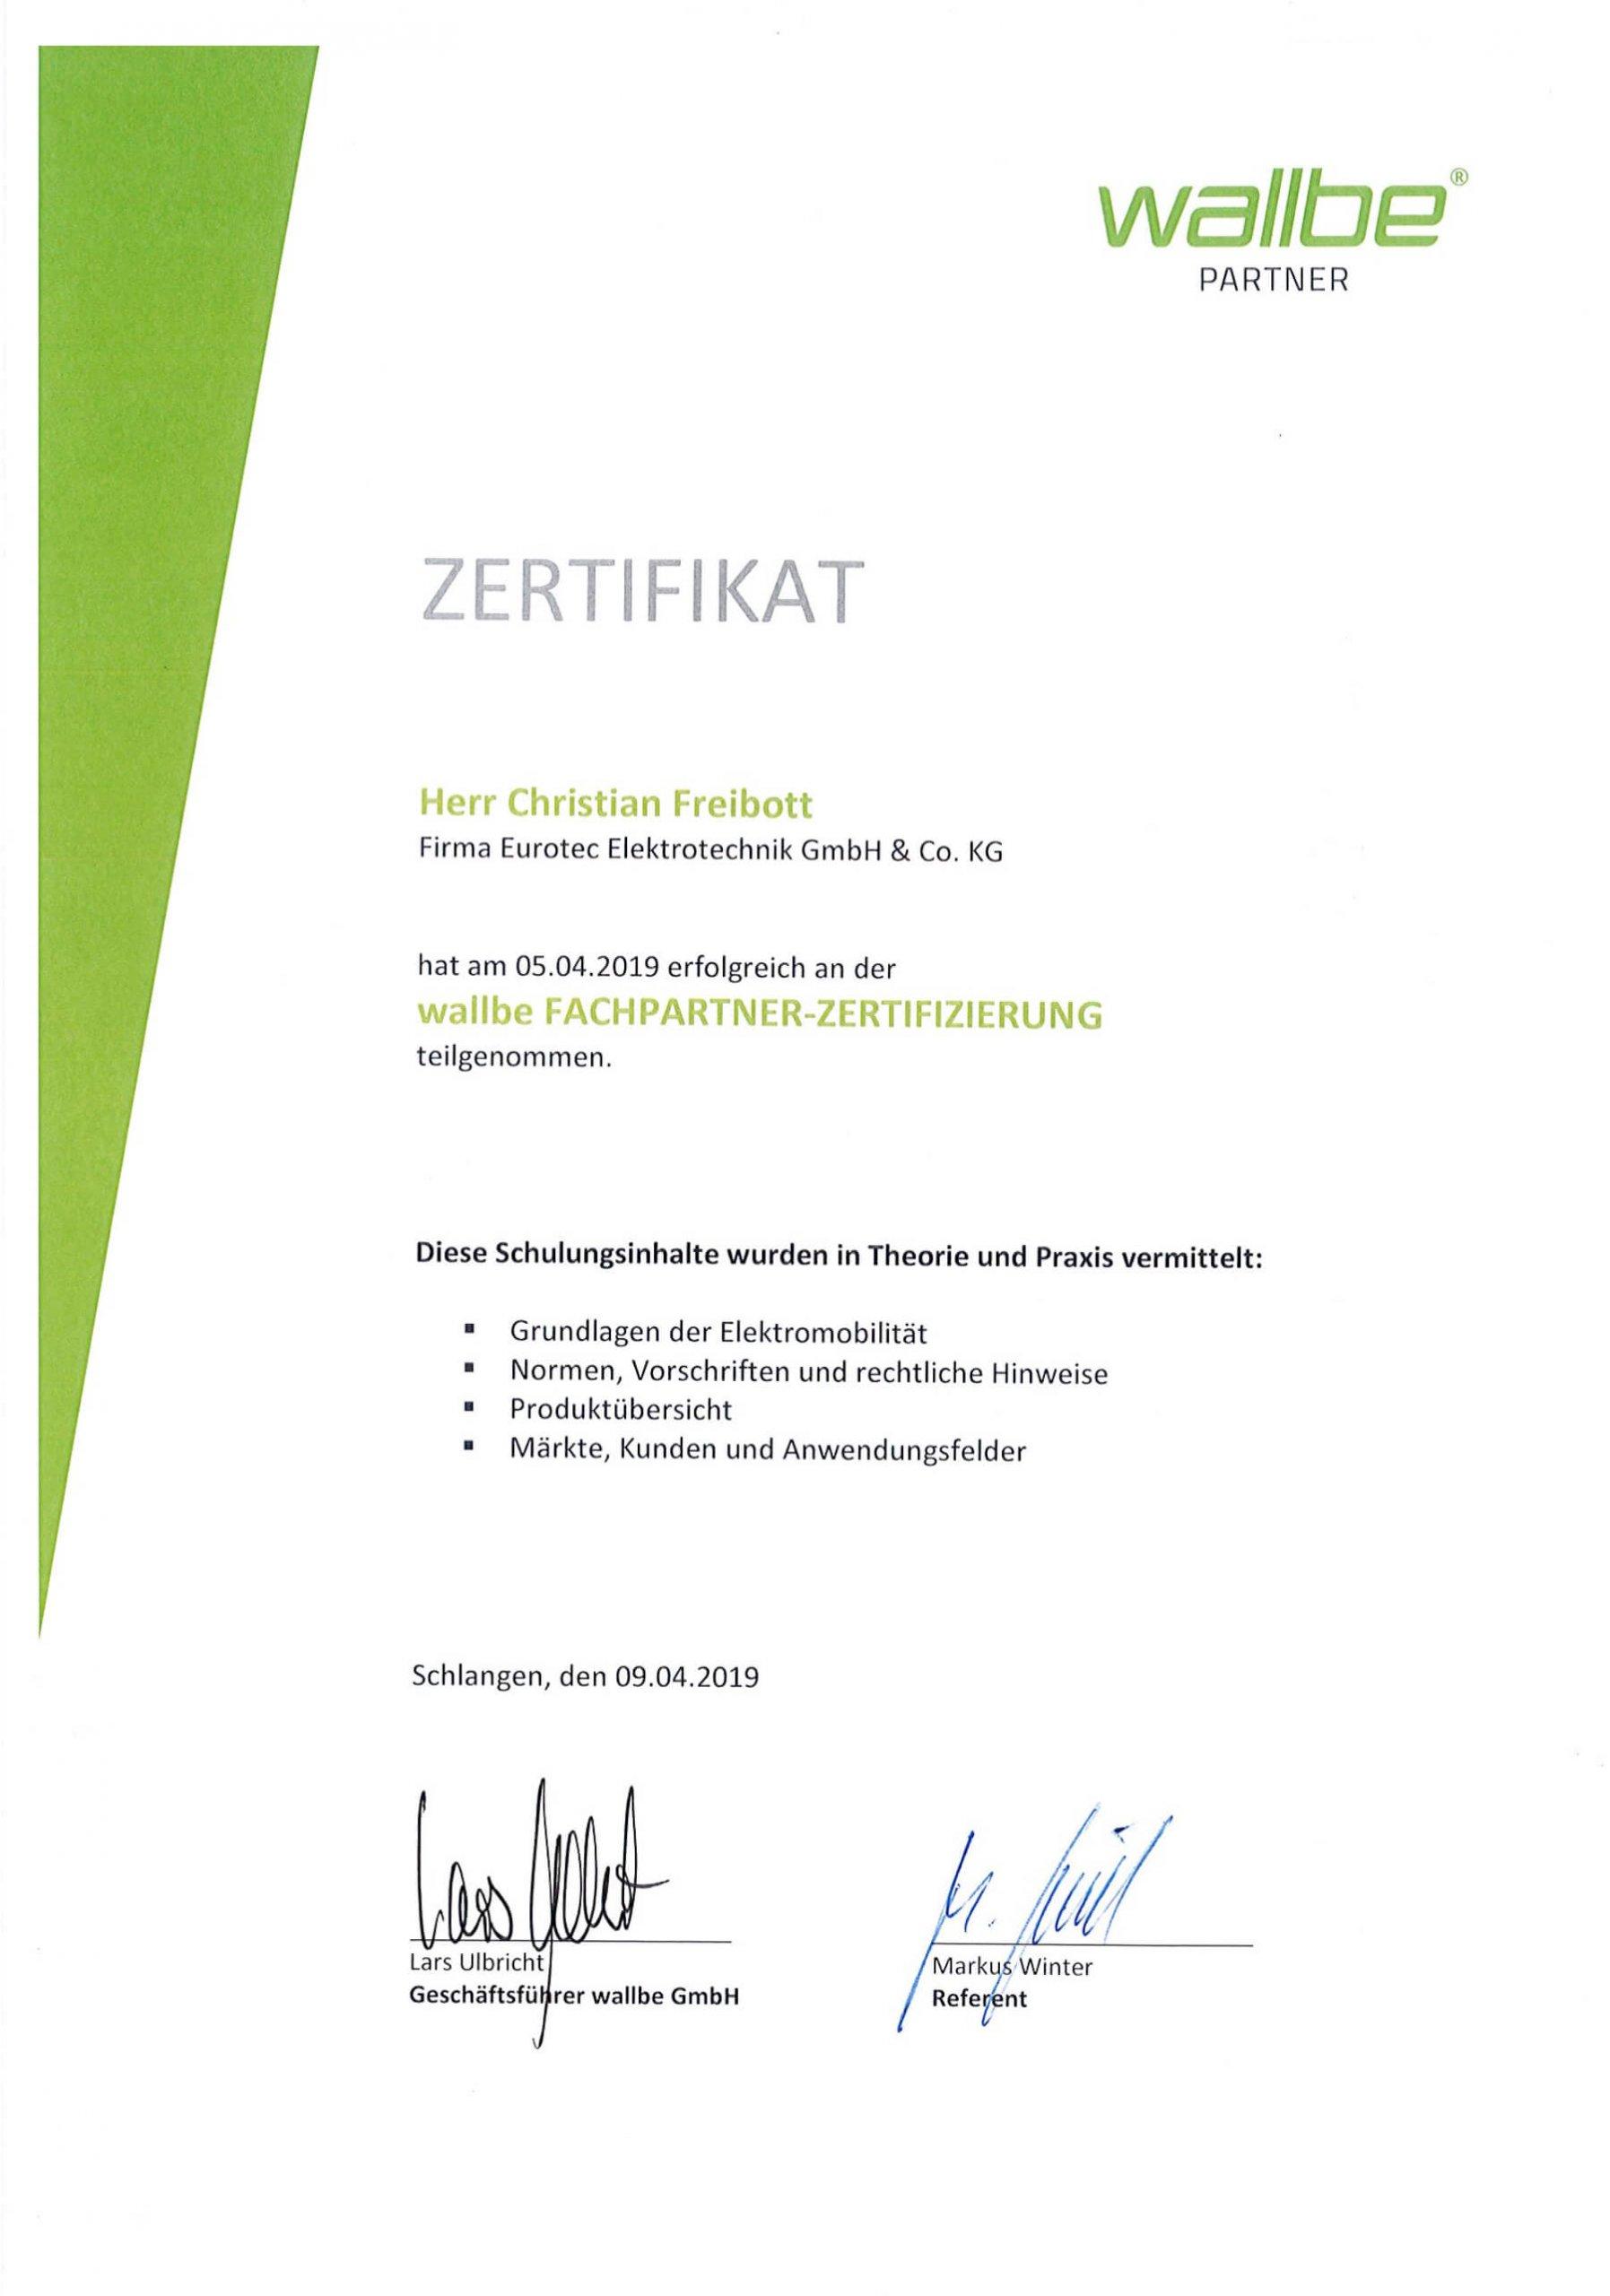 walbe Partner - Zertifikat